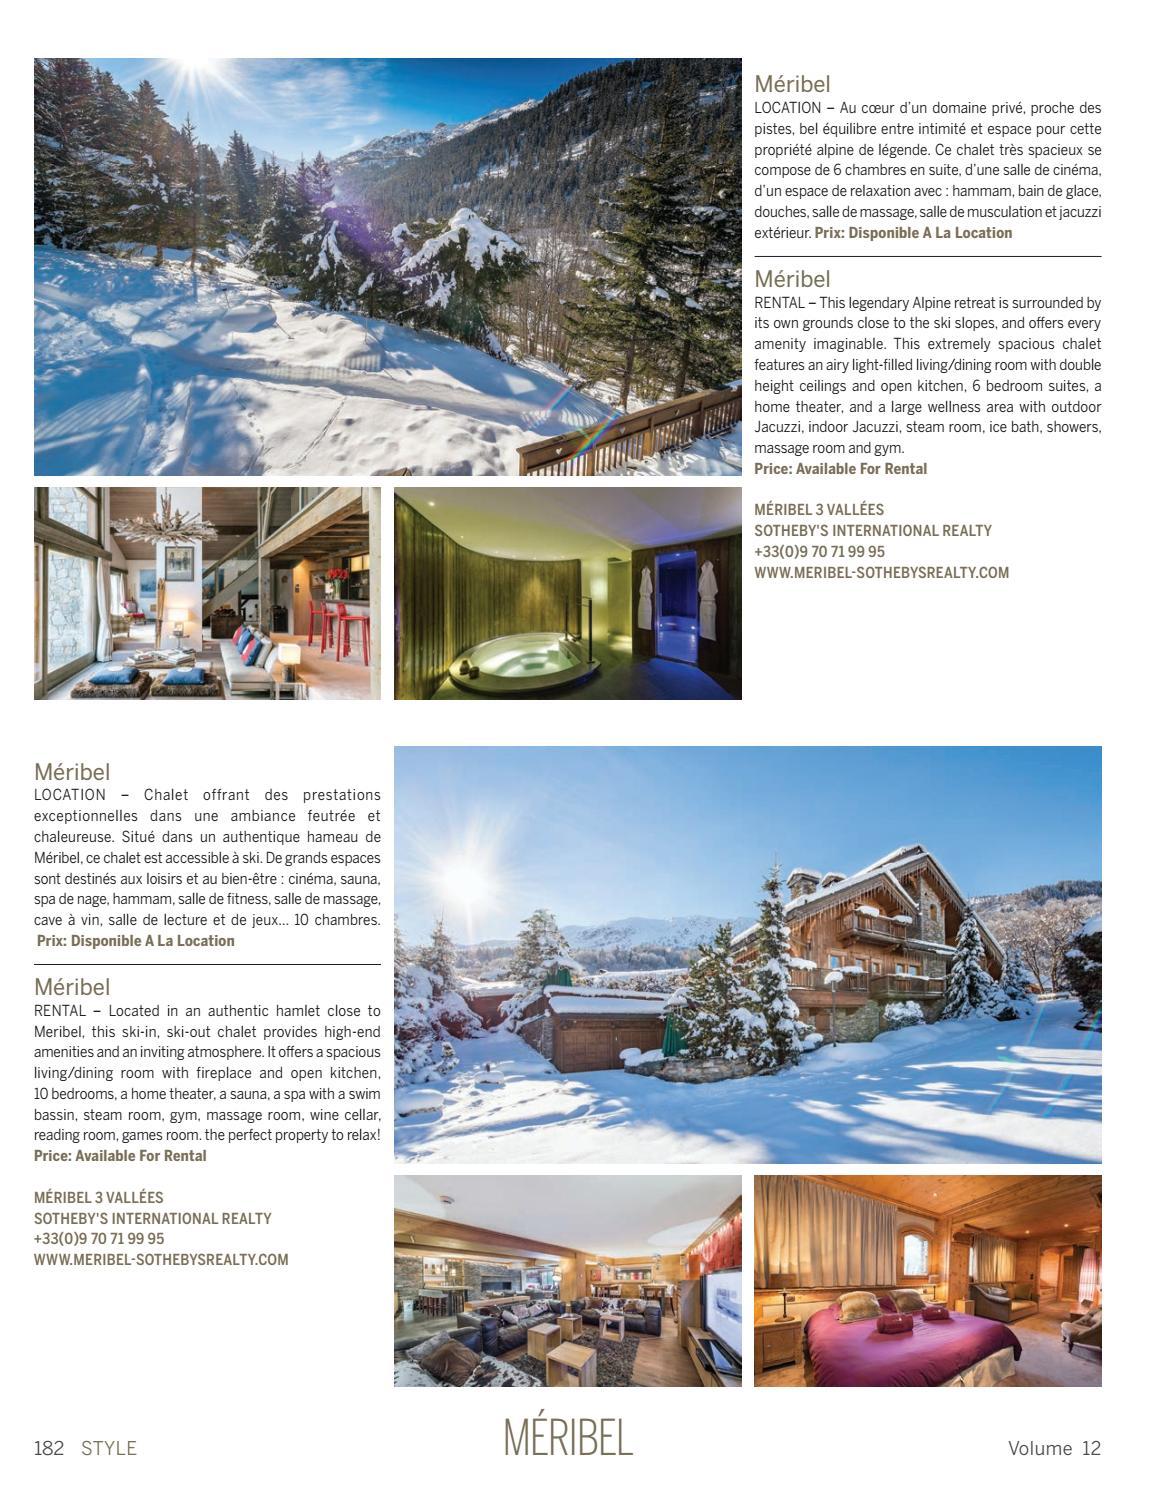 Prix D Un Sauna style - volumen 12sotheby's international realty france